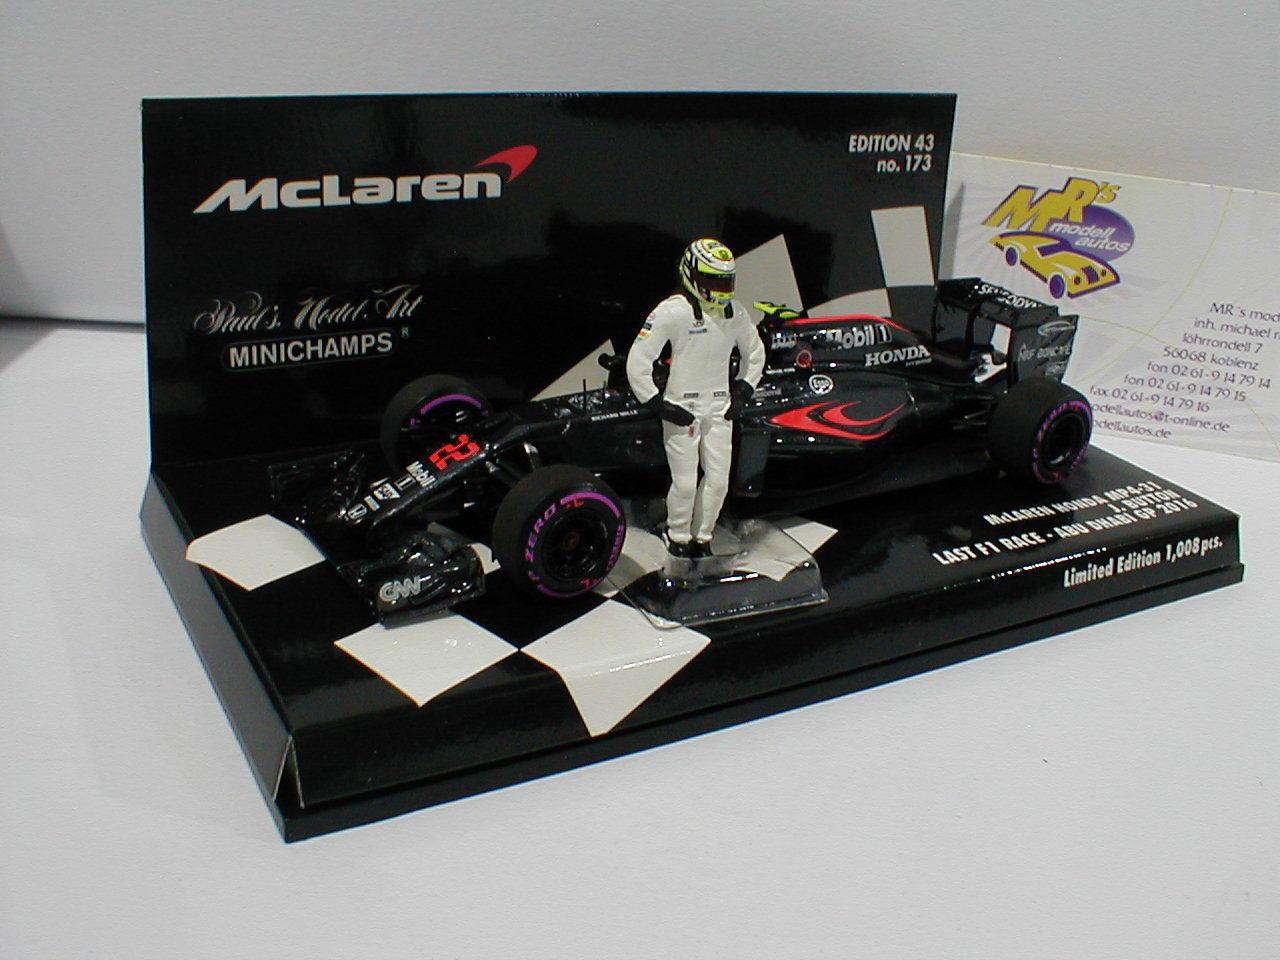 Minichamps 530164022 McLaren mp4-31 no22 Final GP J. bnutton 2016 + Figure 1 43